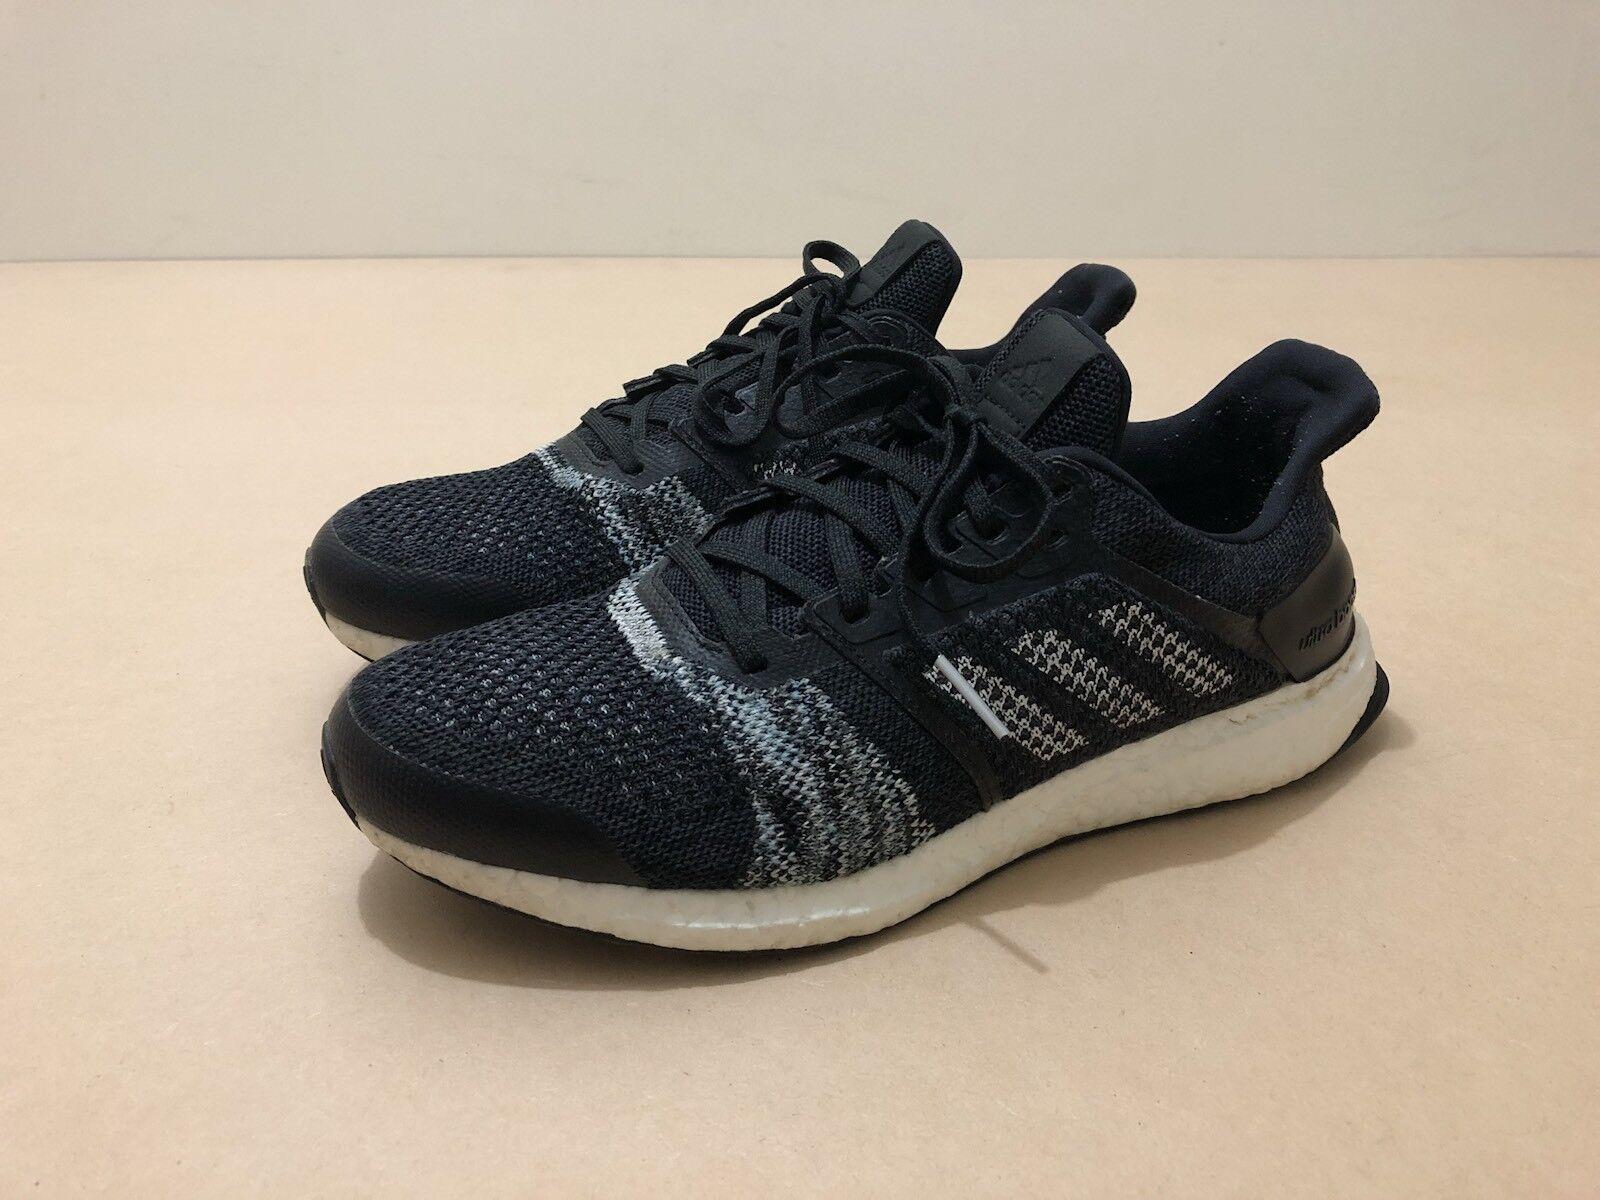 Adidas ultraboost st schuhe mens - us - 11 - Turnschuhe laufen zu fuß schwarz